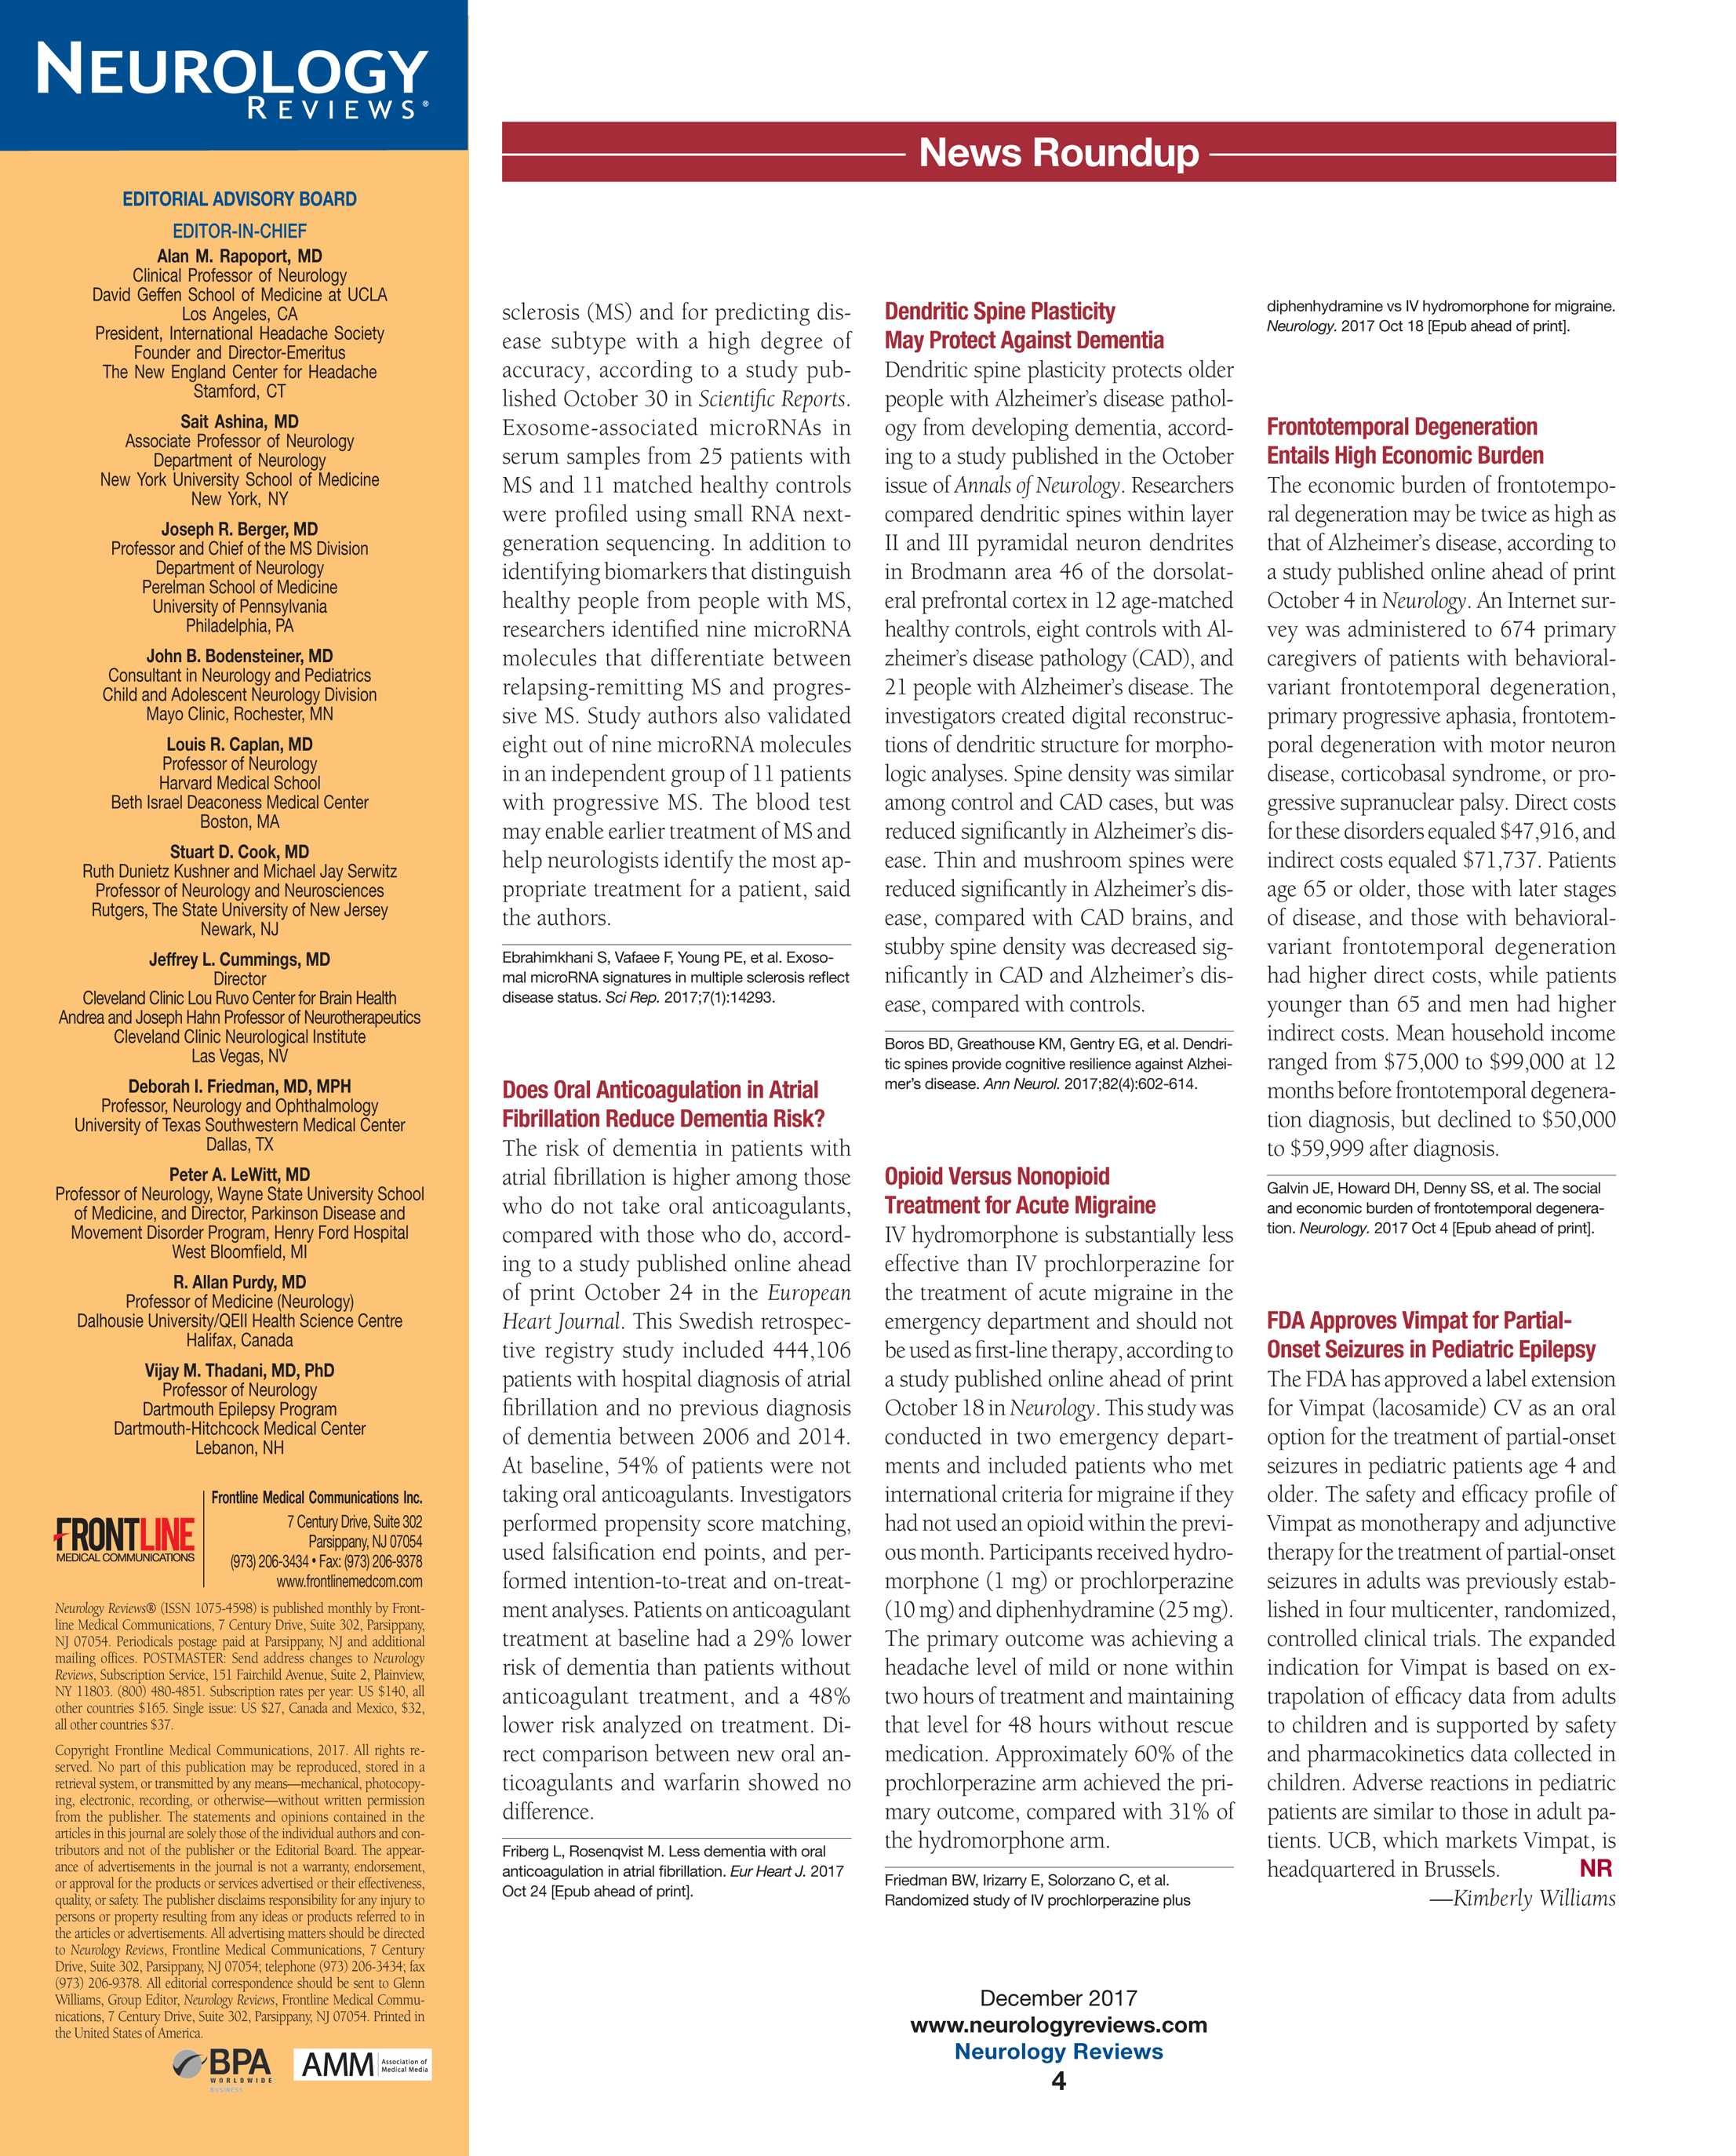 Neurology Reviews - Dec 2017 - page 4